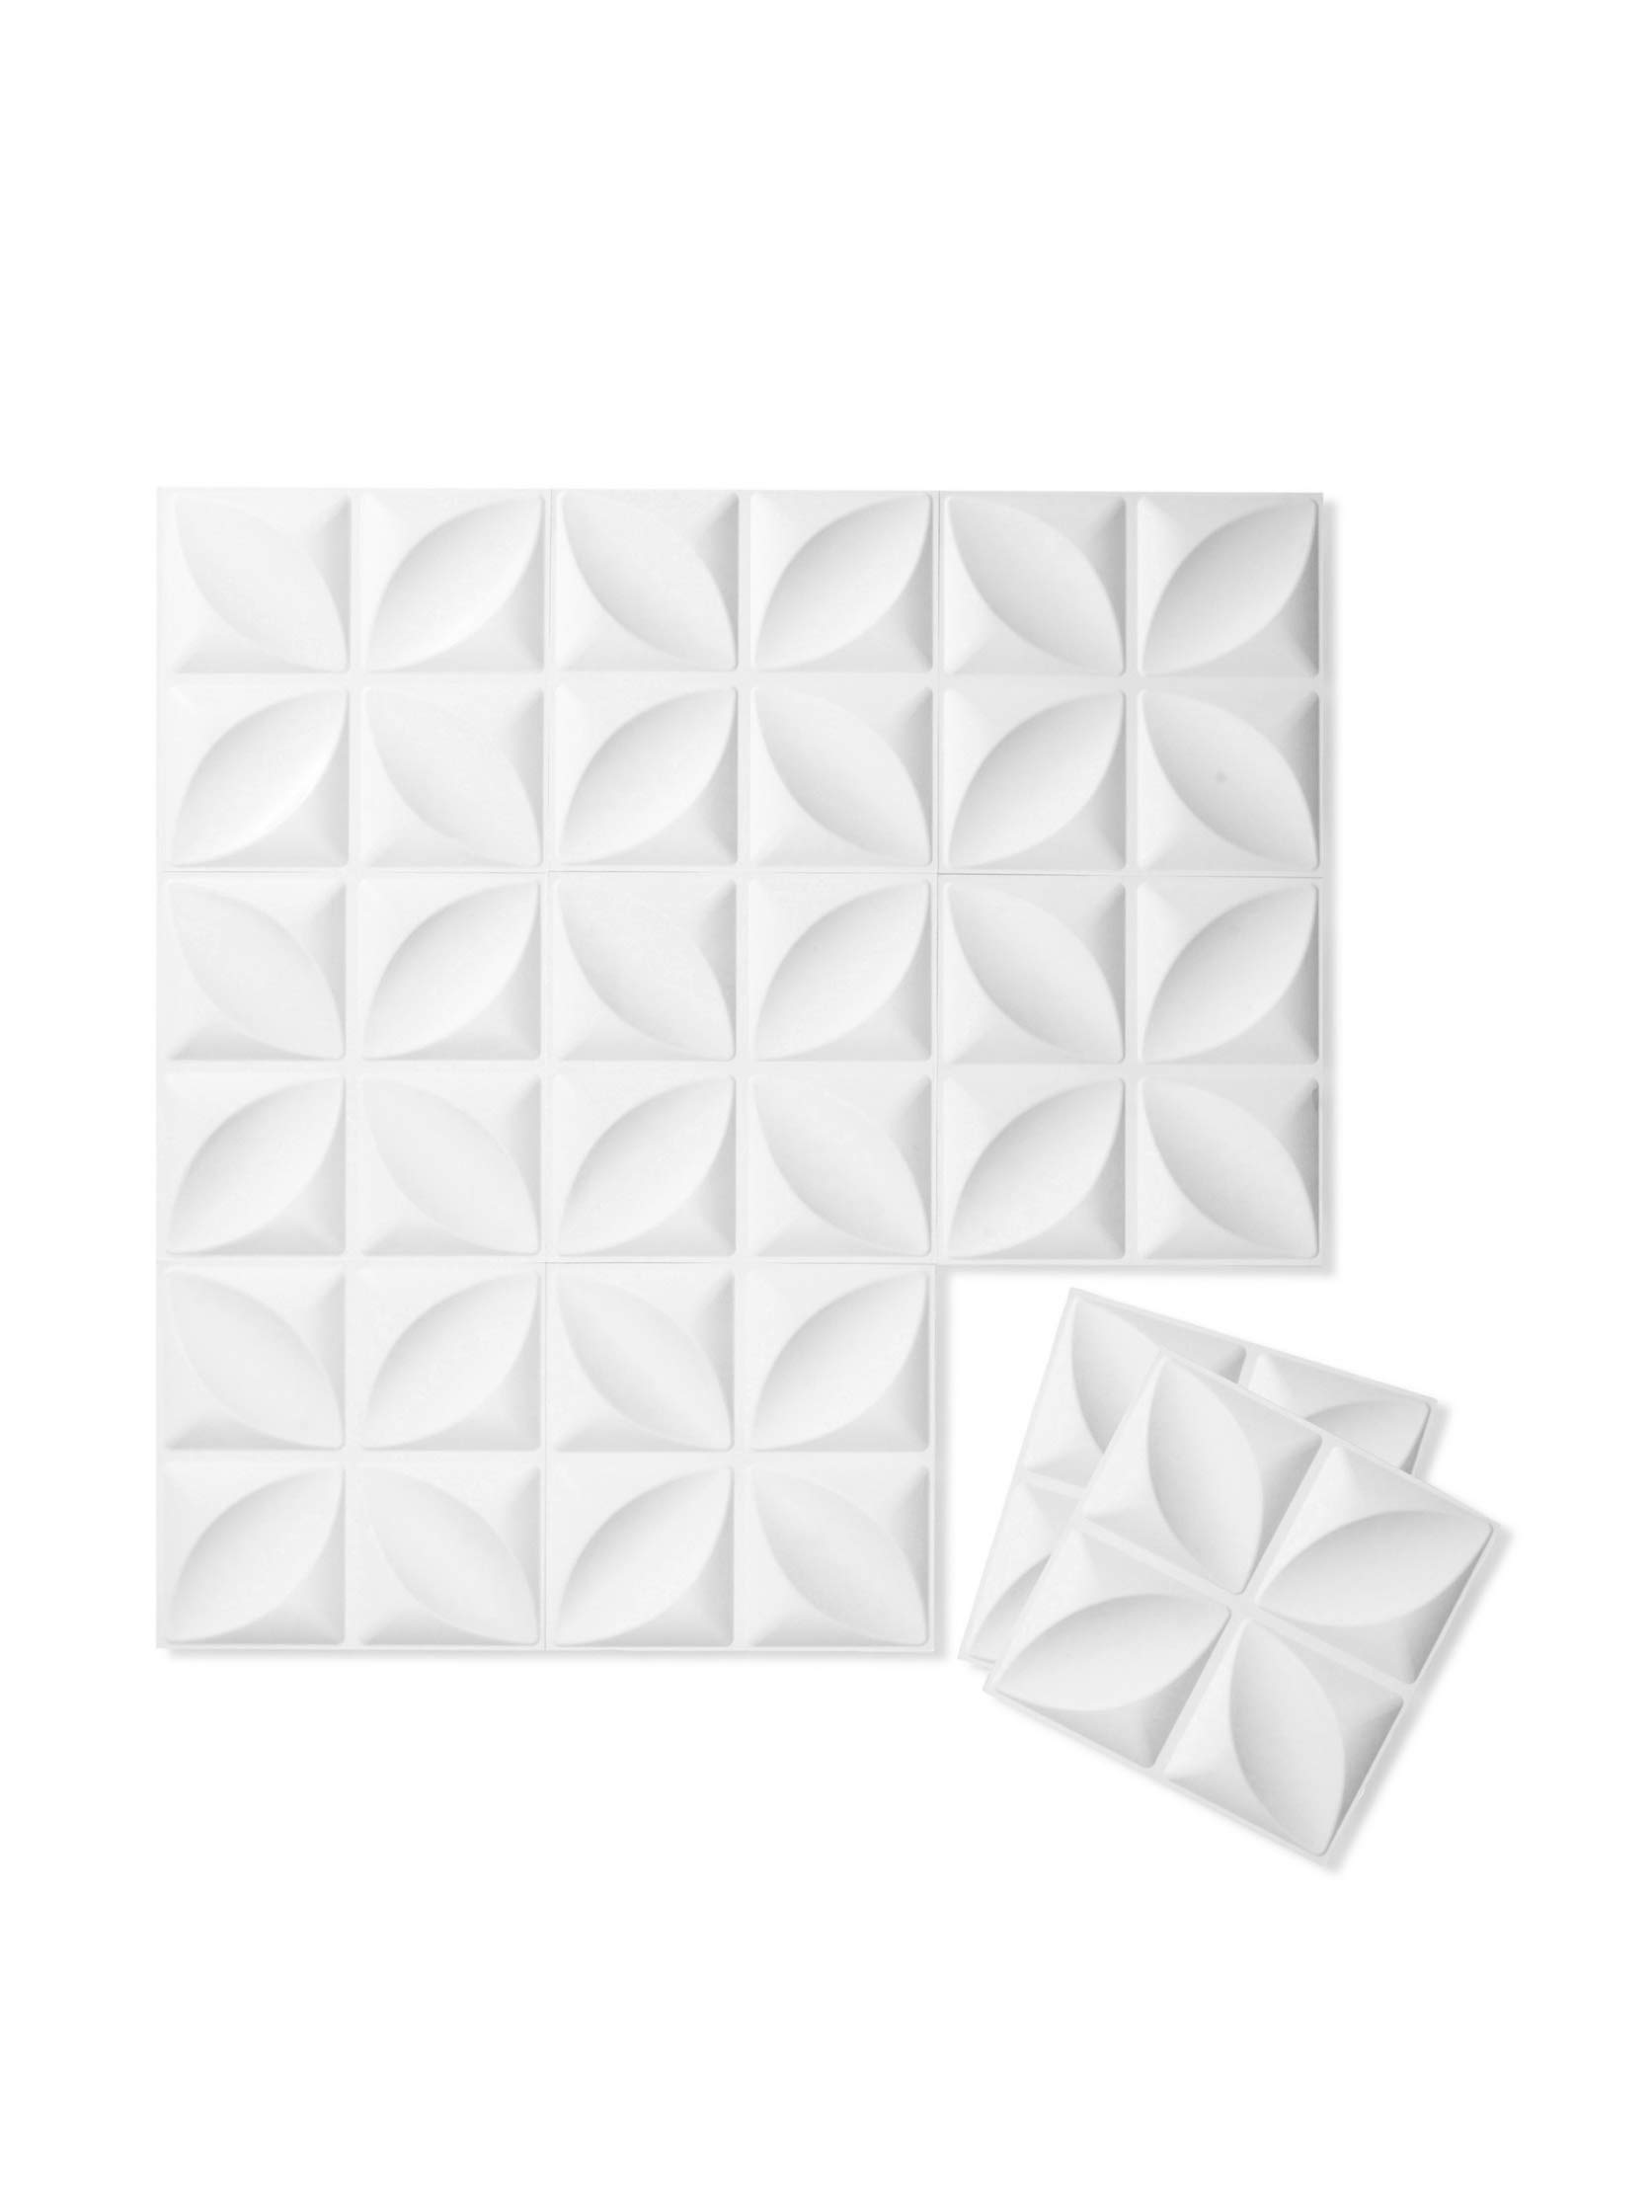 Inhabit Chrysalis Wall Flats - 3d Textured Wall Panels